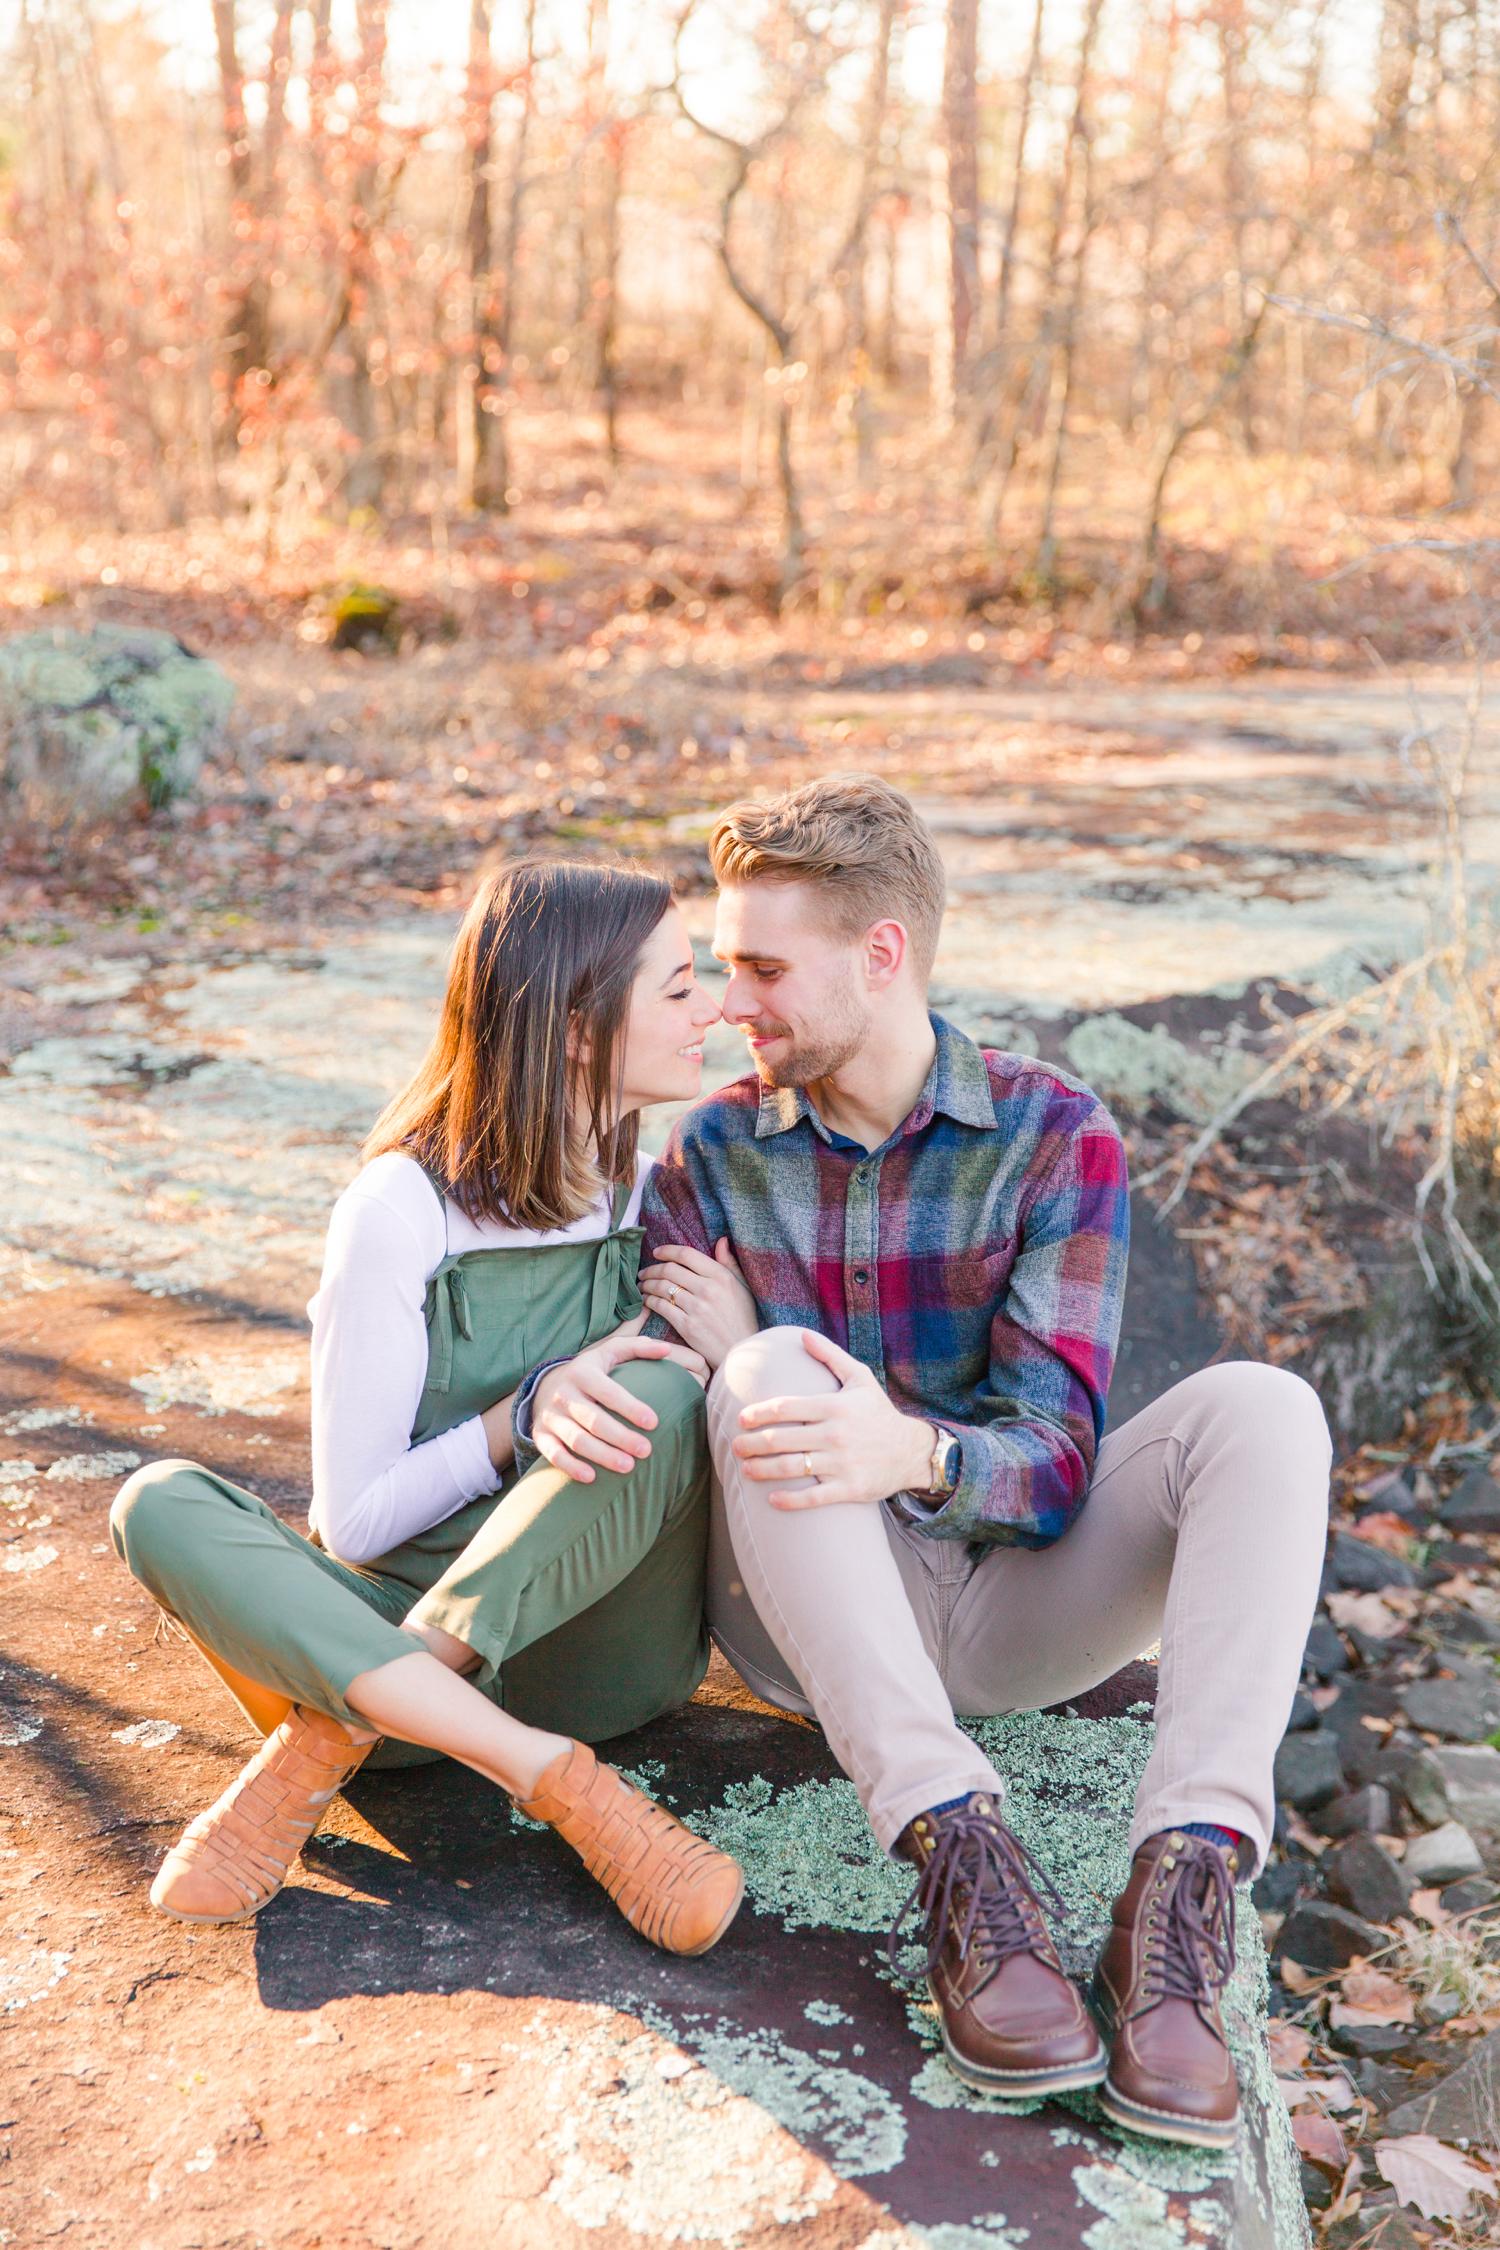 Image 8 of Alex and Alosha